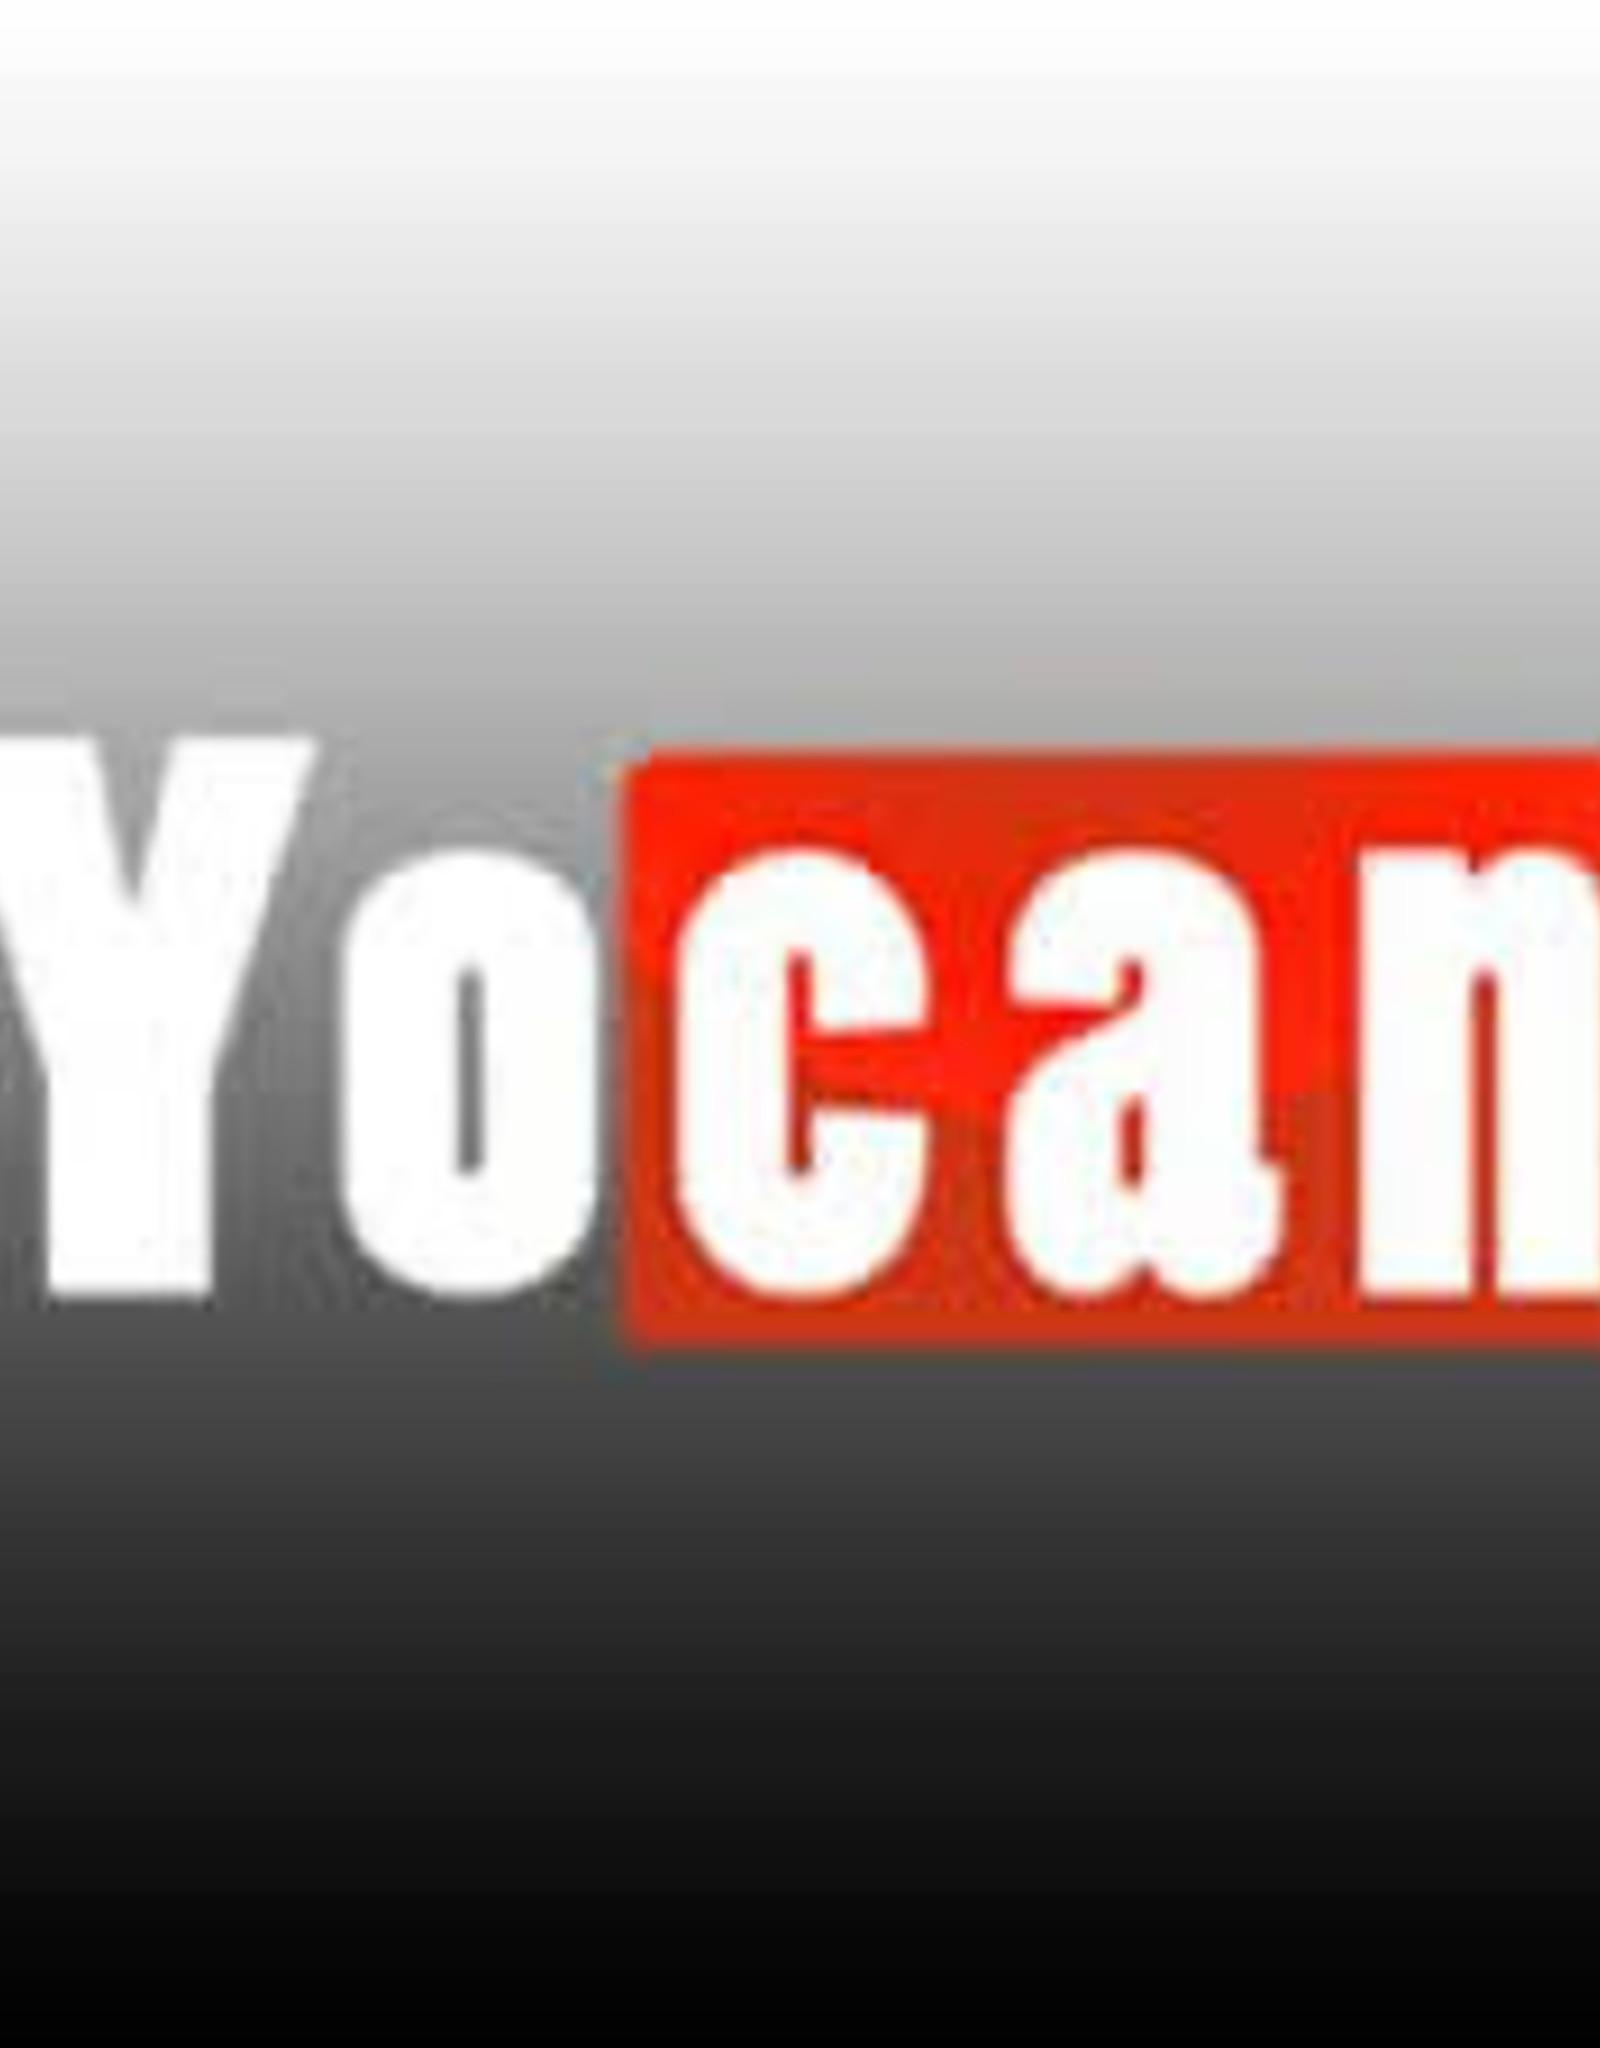 YOCAN YOCAN EVOLVE-D DRY HERB KIT